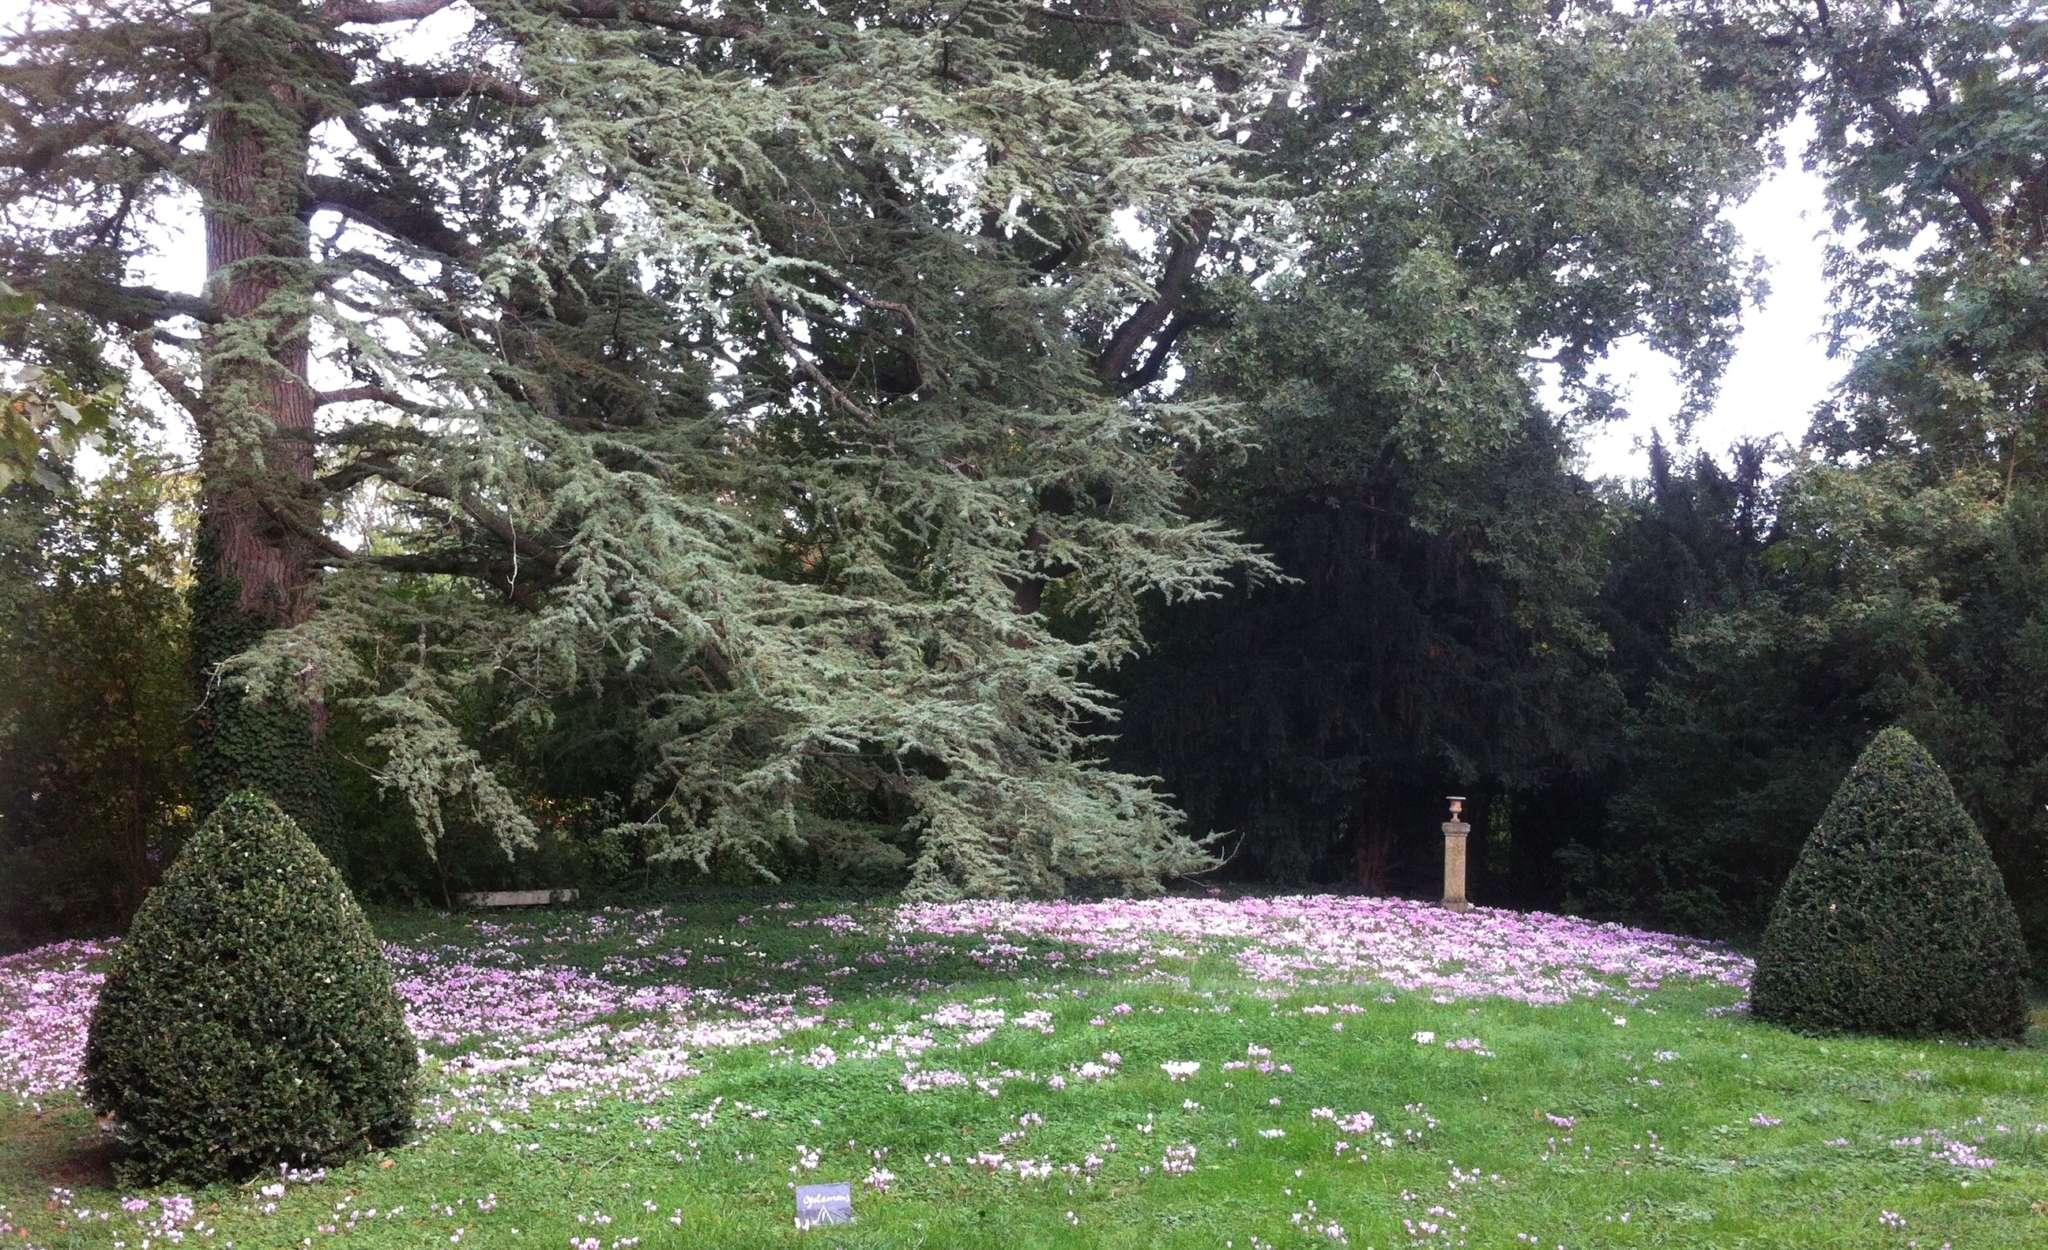 Toscane d'Auvergne - Jardins de la Croze